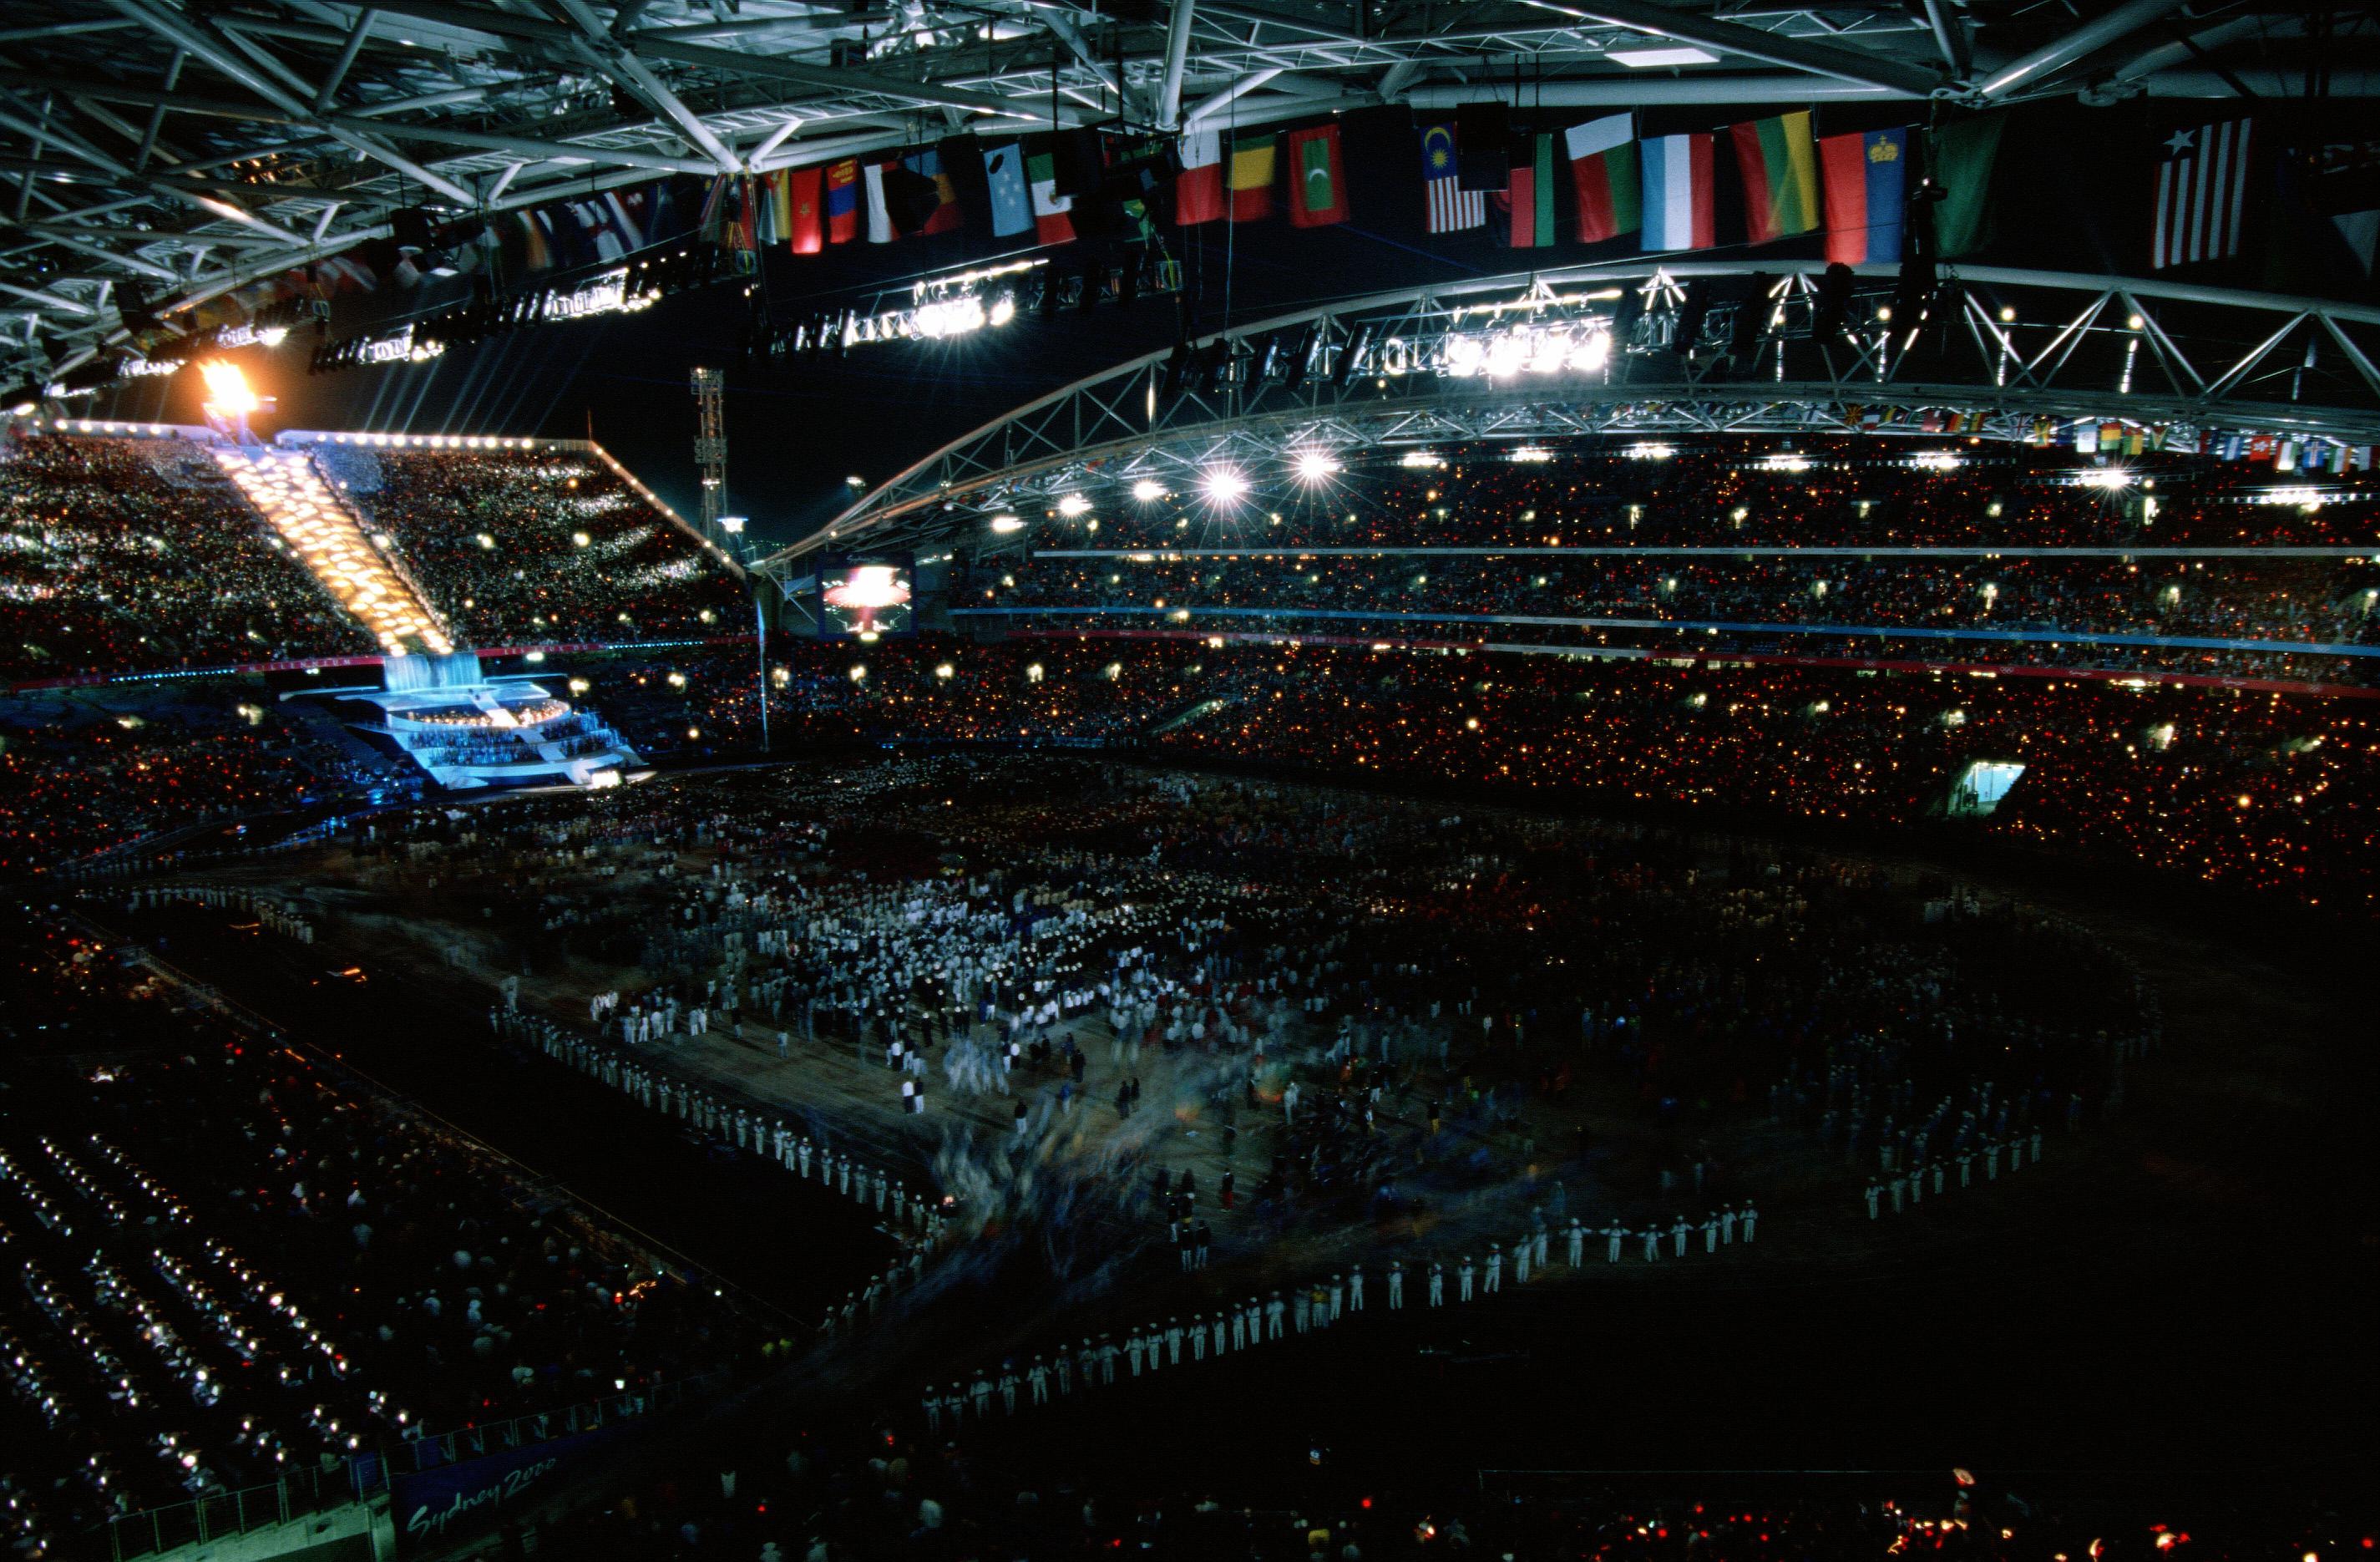 Winter Olympics Opening Ceremony 2020 Nbc.2000 Summer Olympics Opening Ceremony Wikipedia